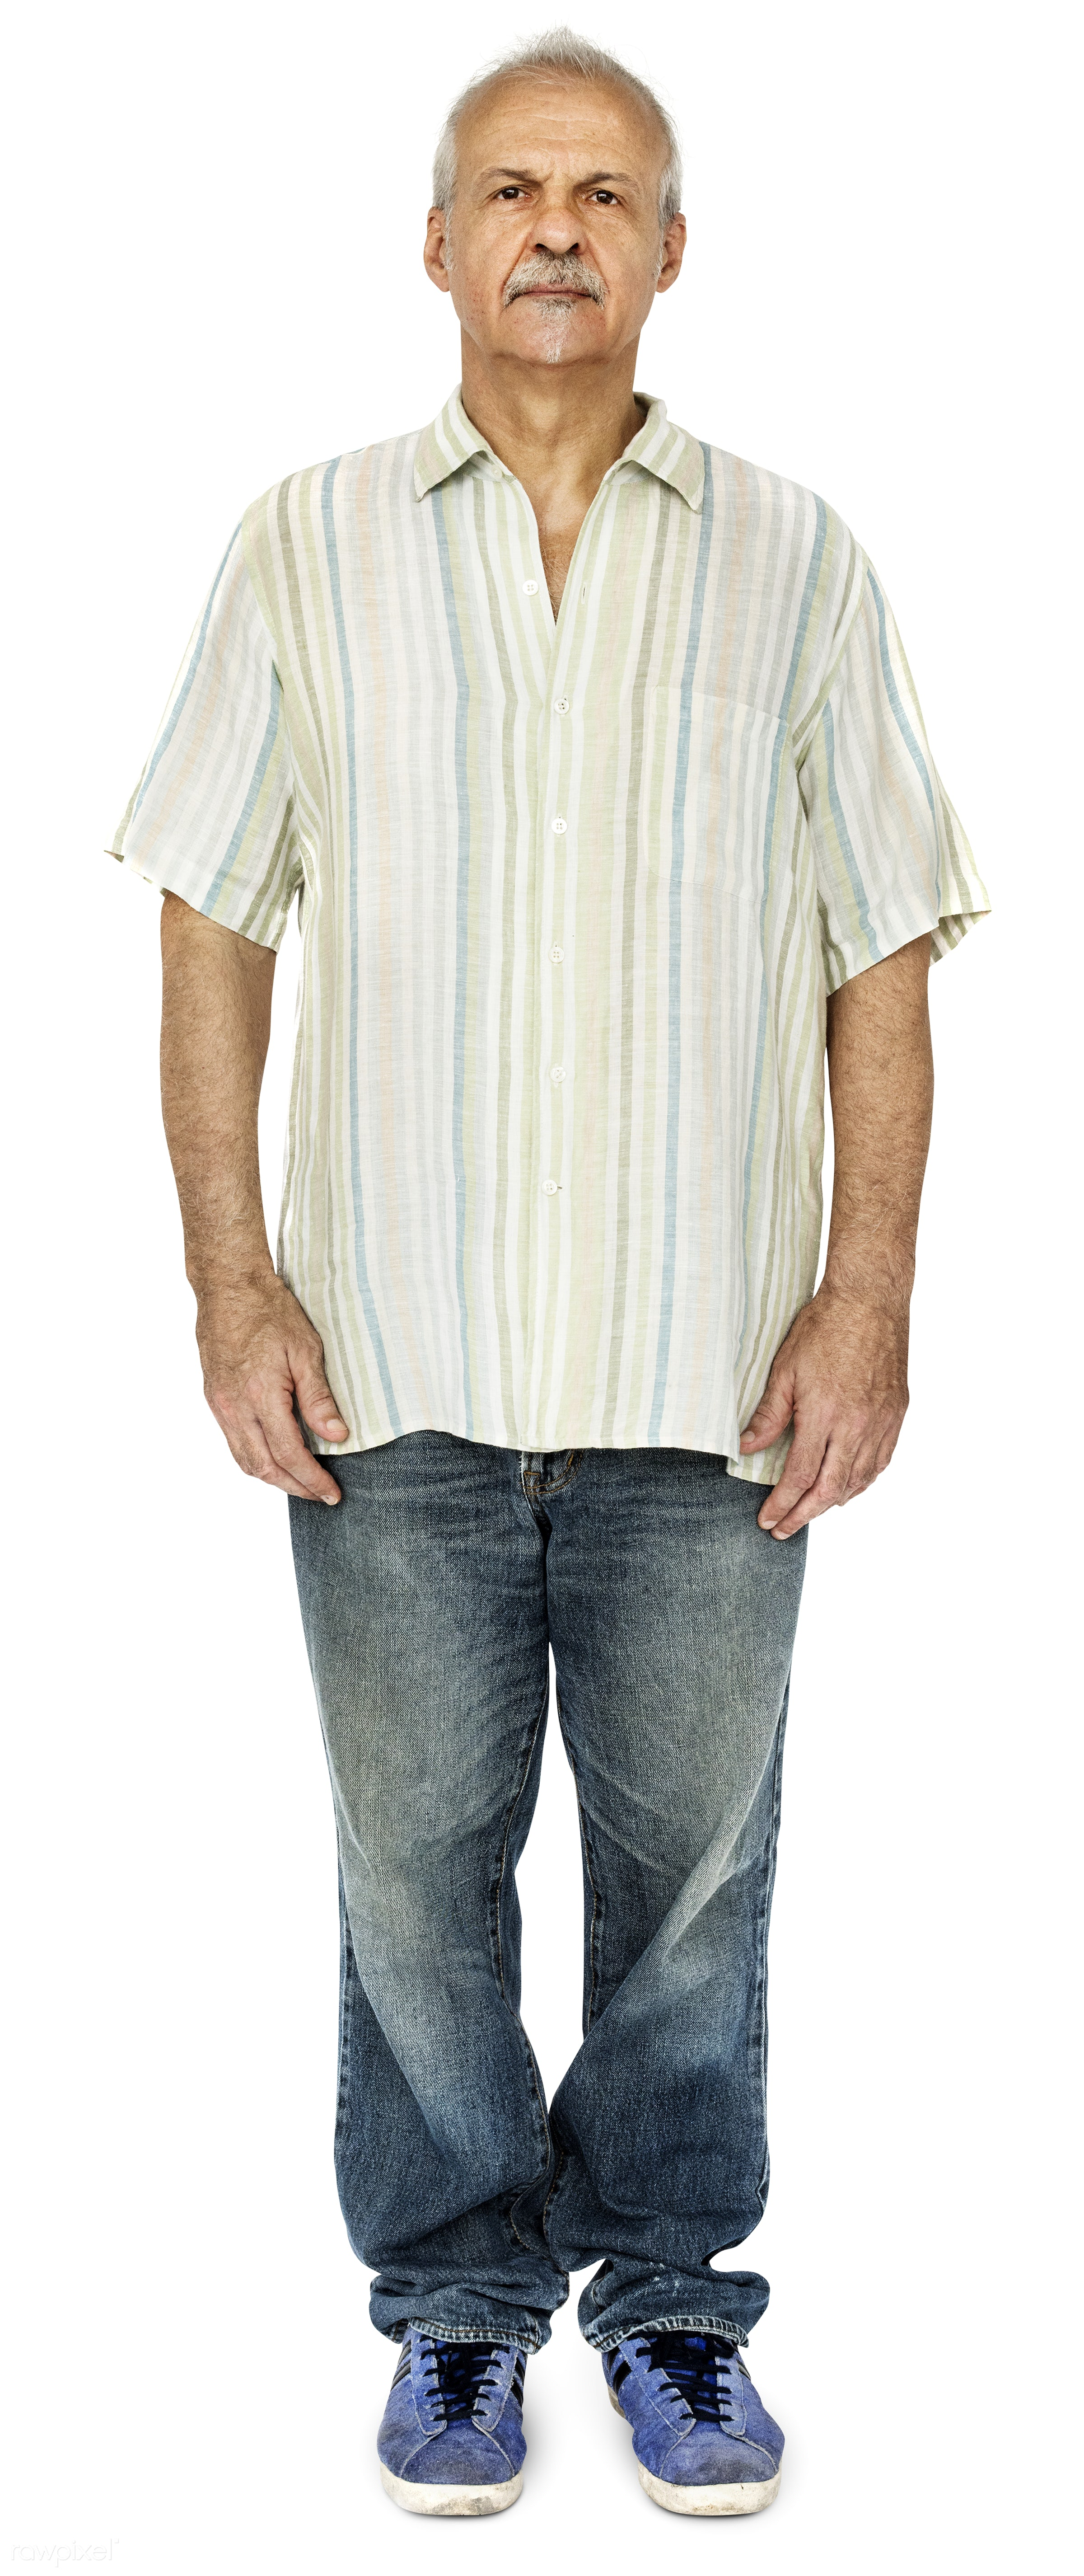 Portrait of a British elderly man - adult, alone, american, britain, british, caucasian, cheerful, closeup, elderly, emotion...